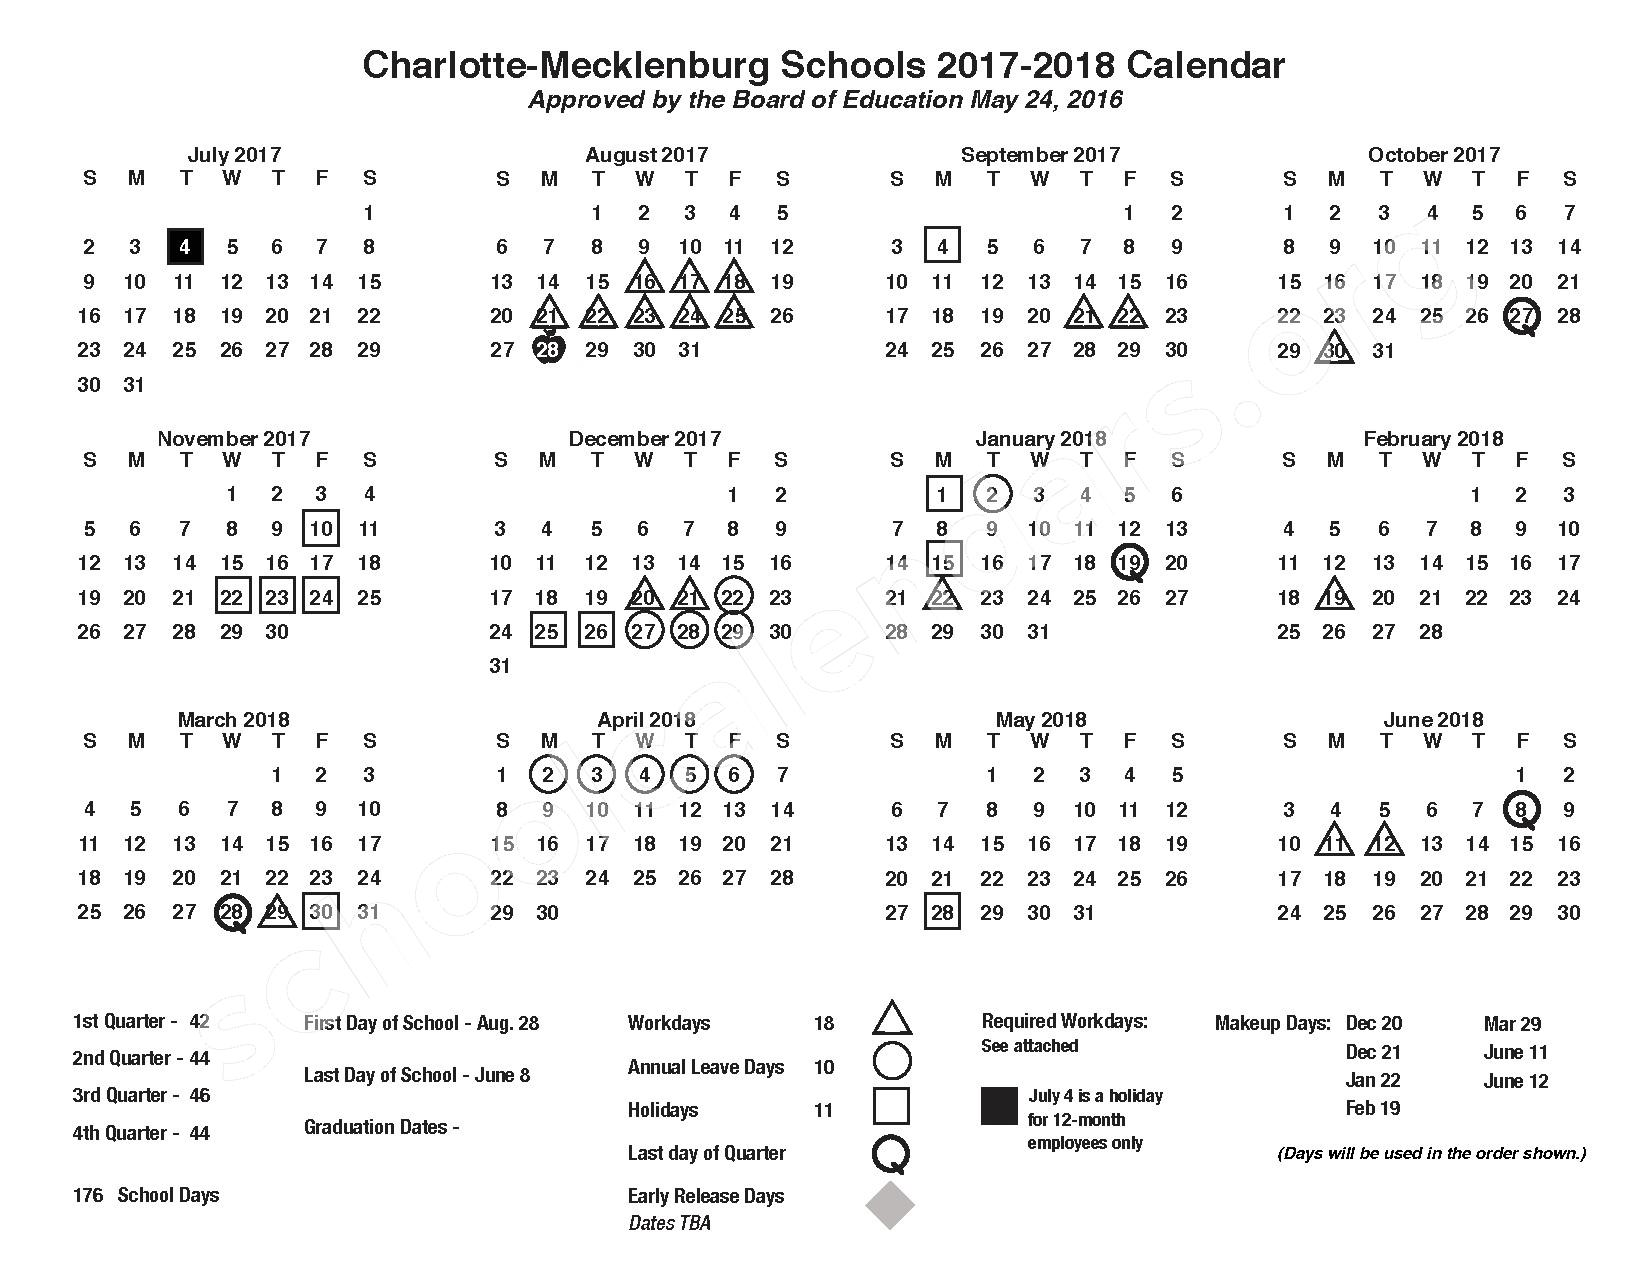 Charlotte-Mecklenburg Schools Calendars – Charlotte, NC